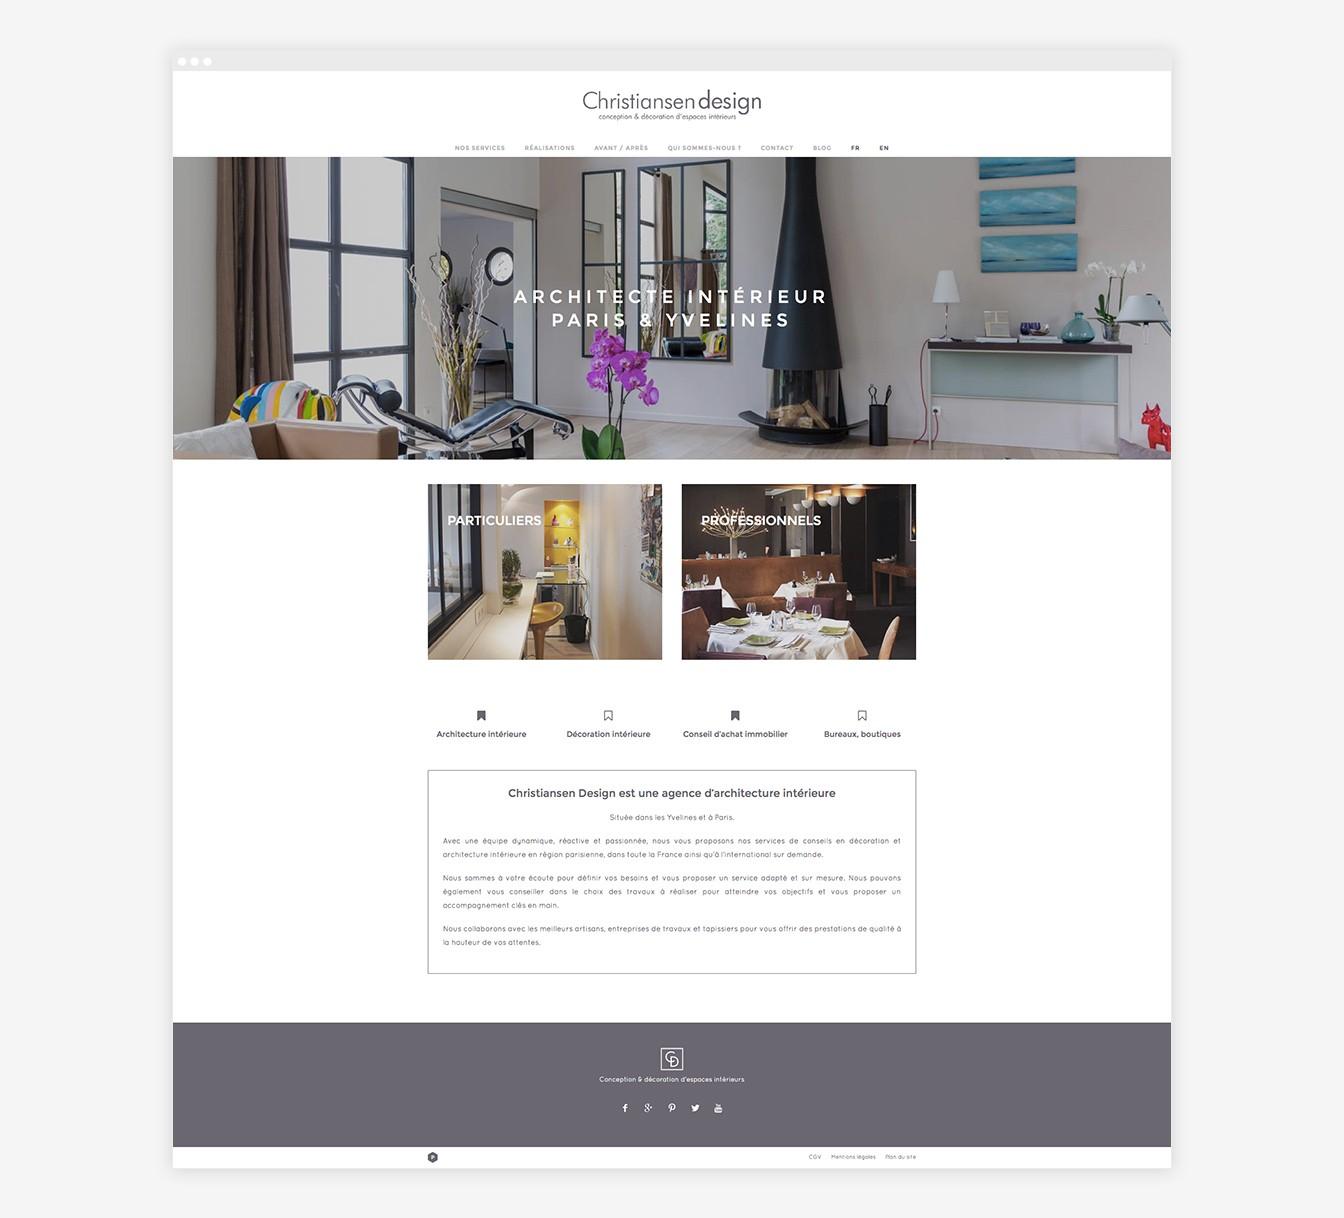 christiansen-design-2016-web-02-details-pikteo-webdesign-graphic-design-freelance-paris-bruxelles-lyon